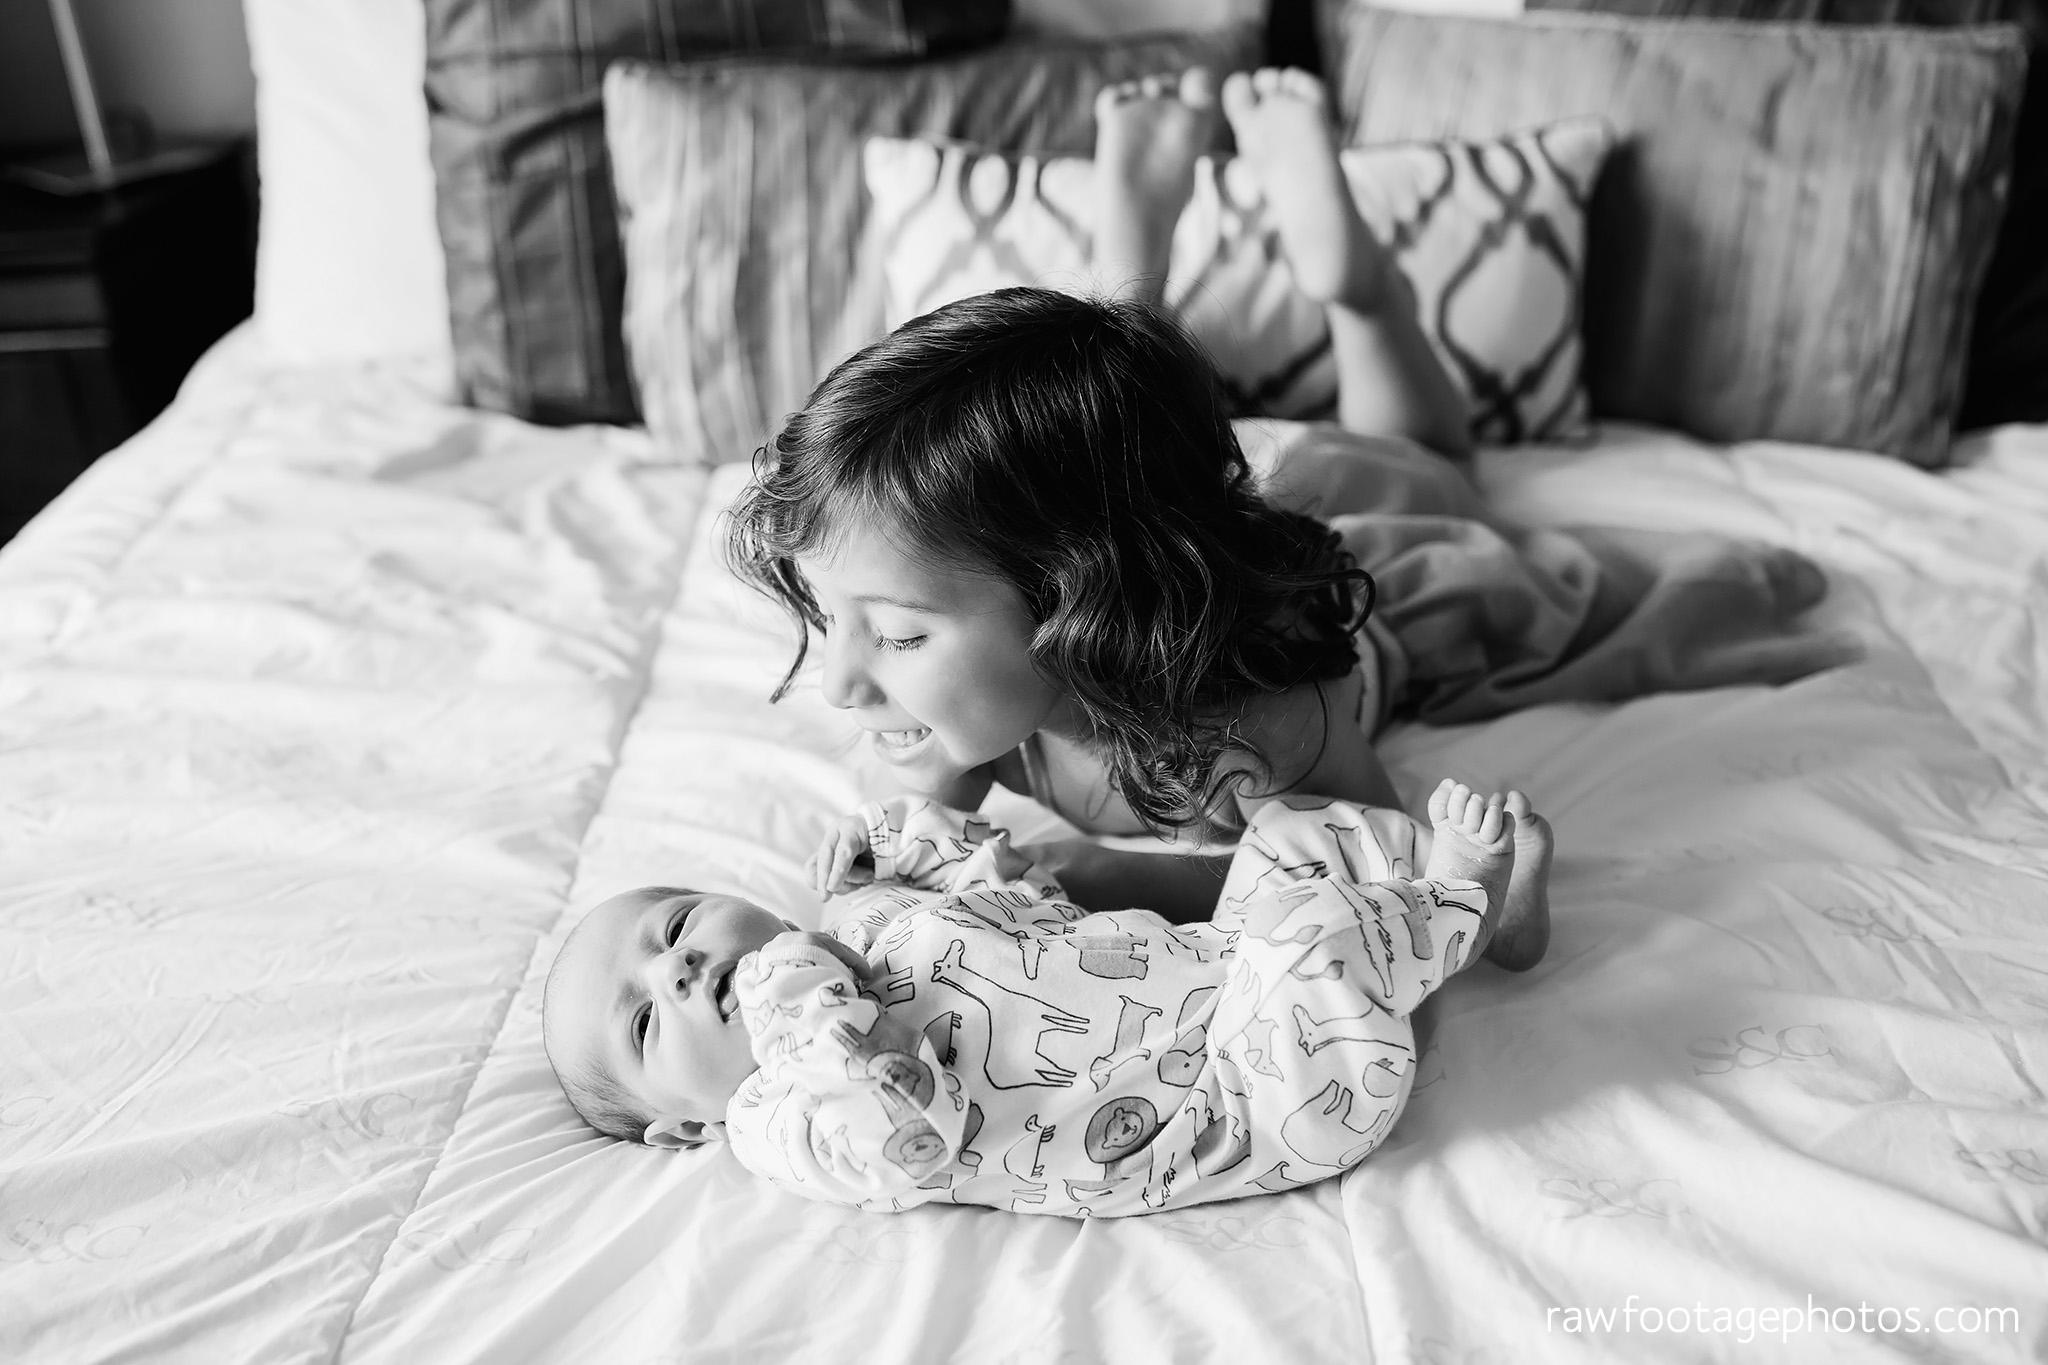 london_ontario_newborn_lifestyle_photographer-baby_nate-raw_footage_photography009.jpg